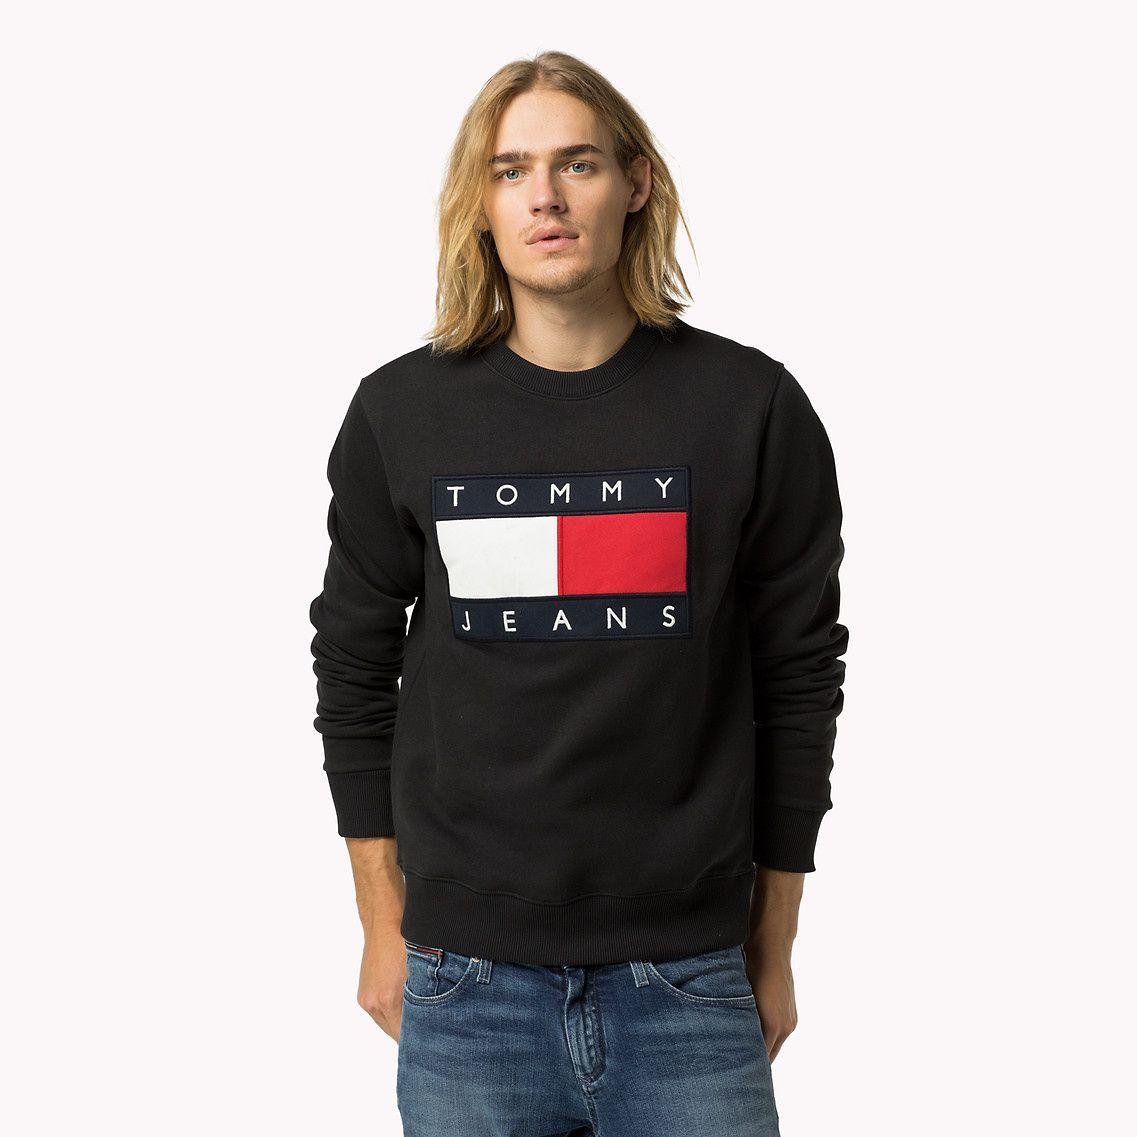 Cotton Fleece Logo Sweatshirt Black Tommy Hilfiger 8719253944703 Sweatshirts Tommy Hilfiger Tommy Hilfiger Fashion